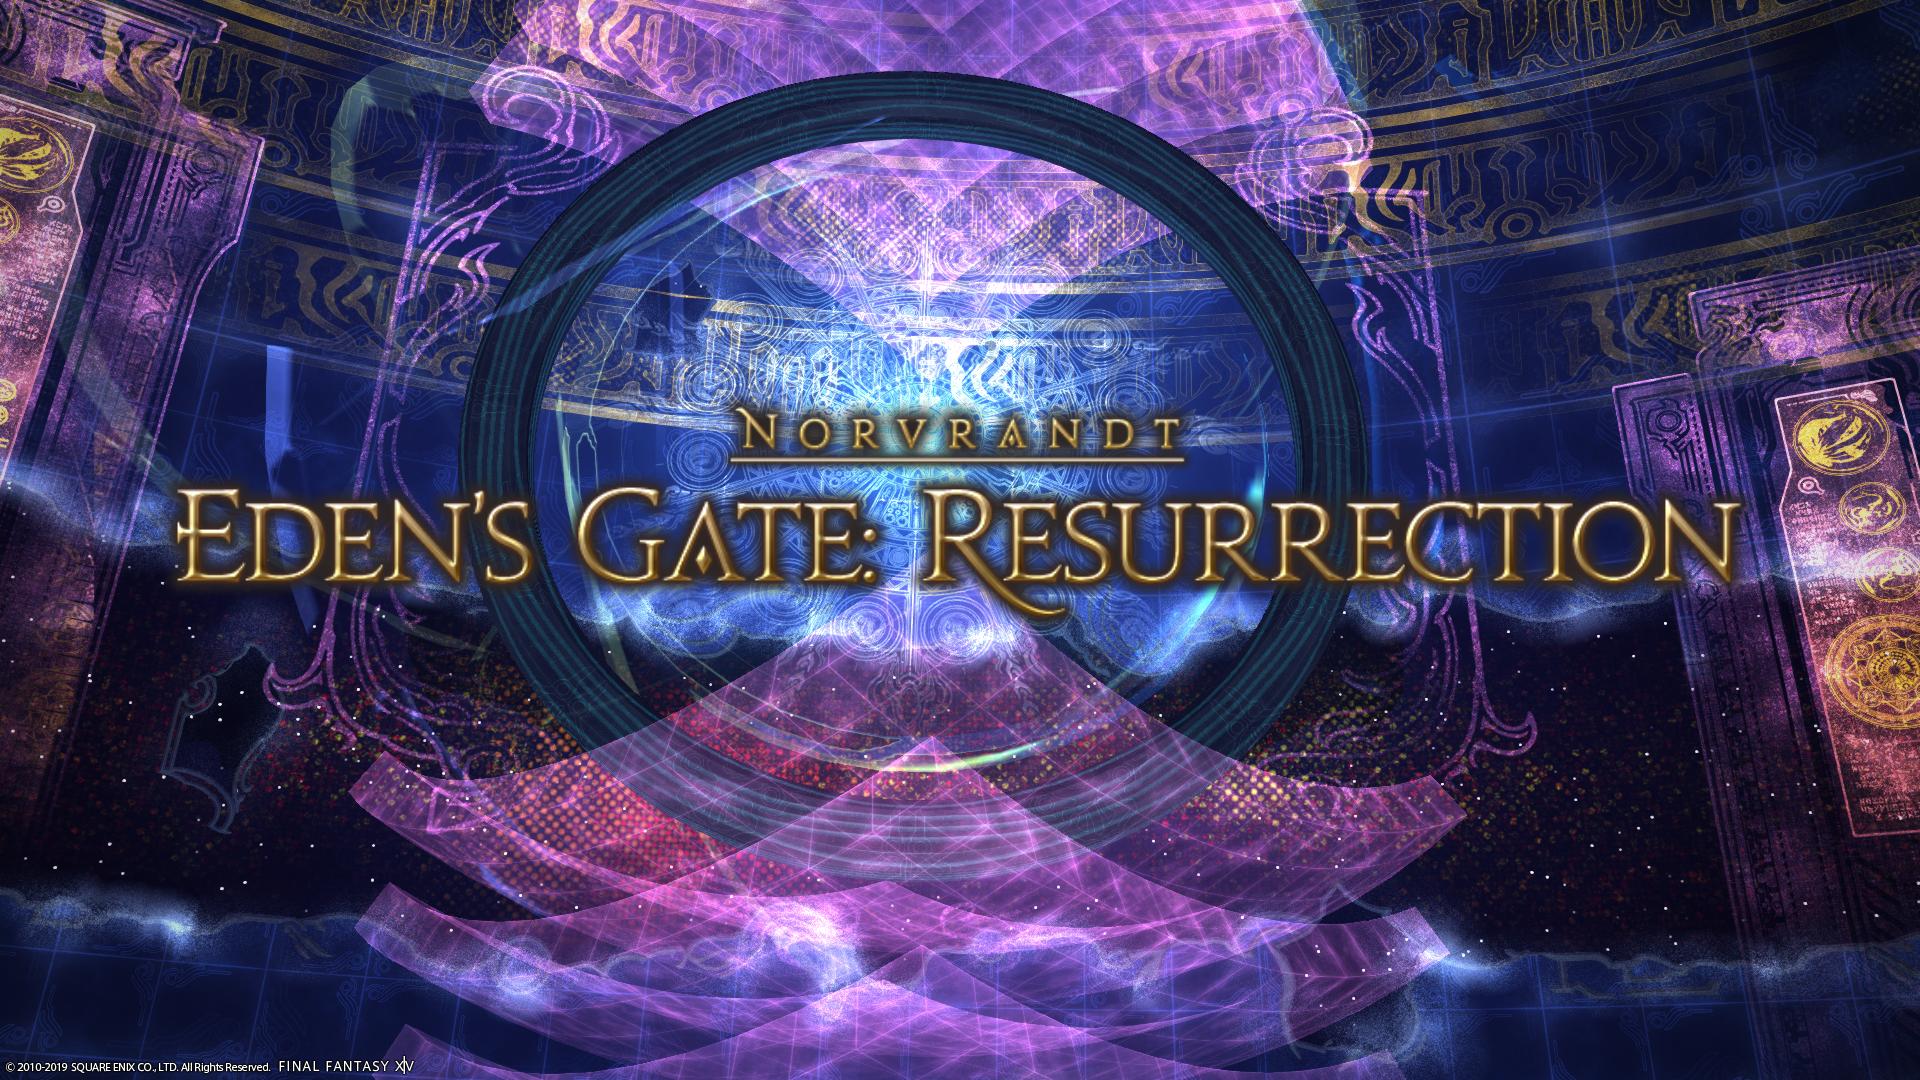 Eden's Gate: Resurrection | Final Fantasy Wiki | FANDOM